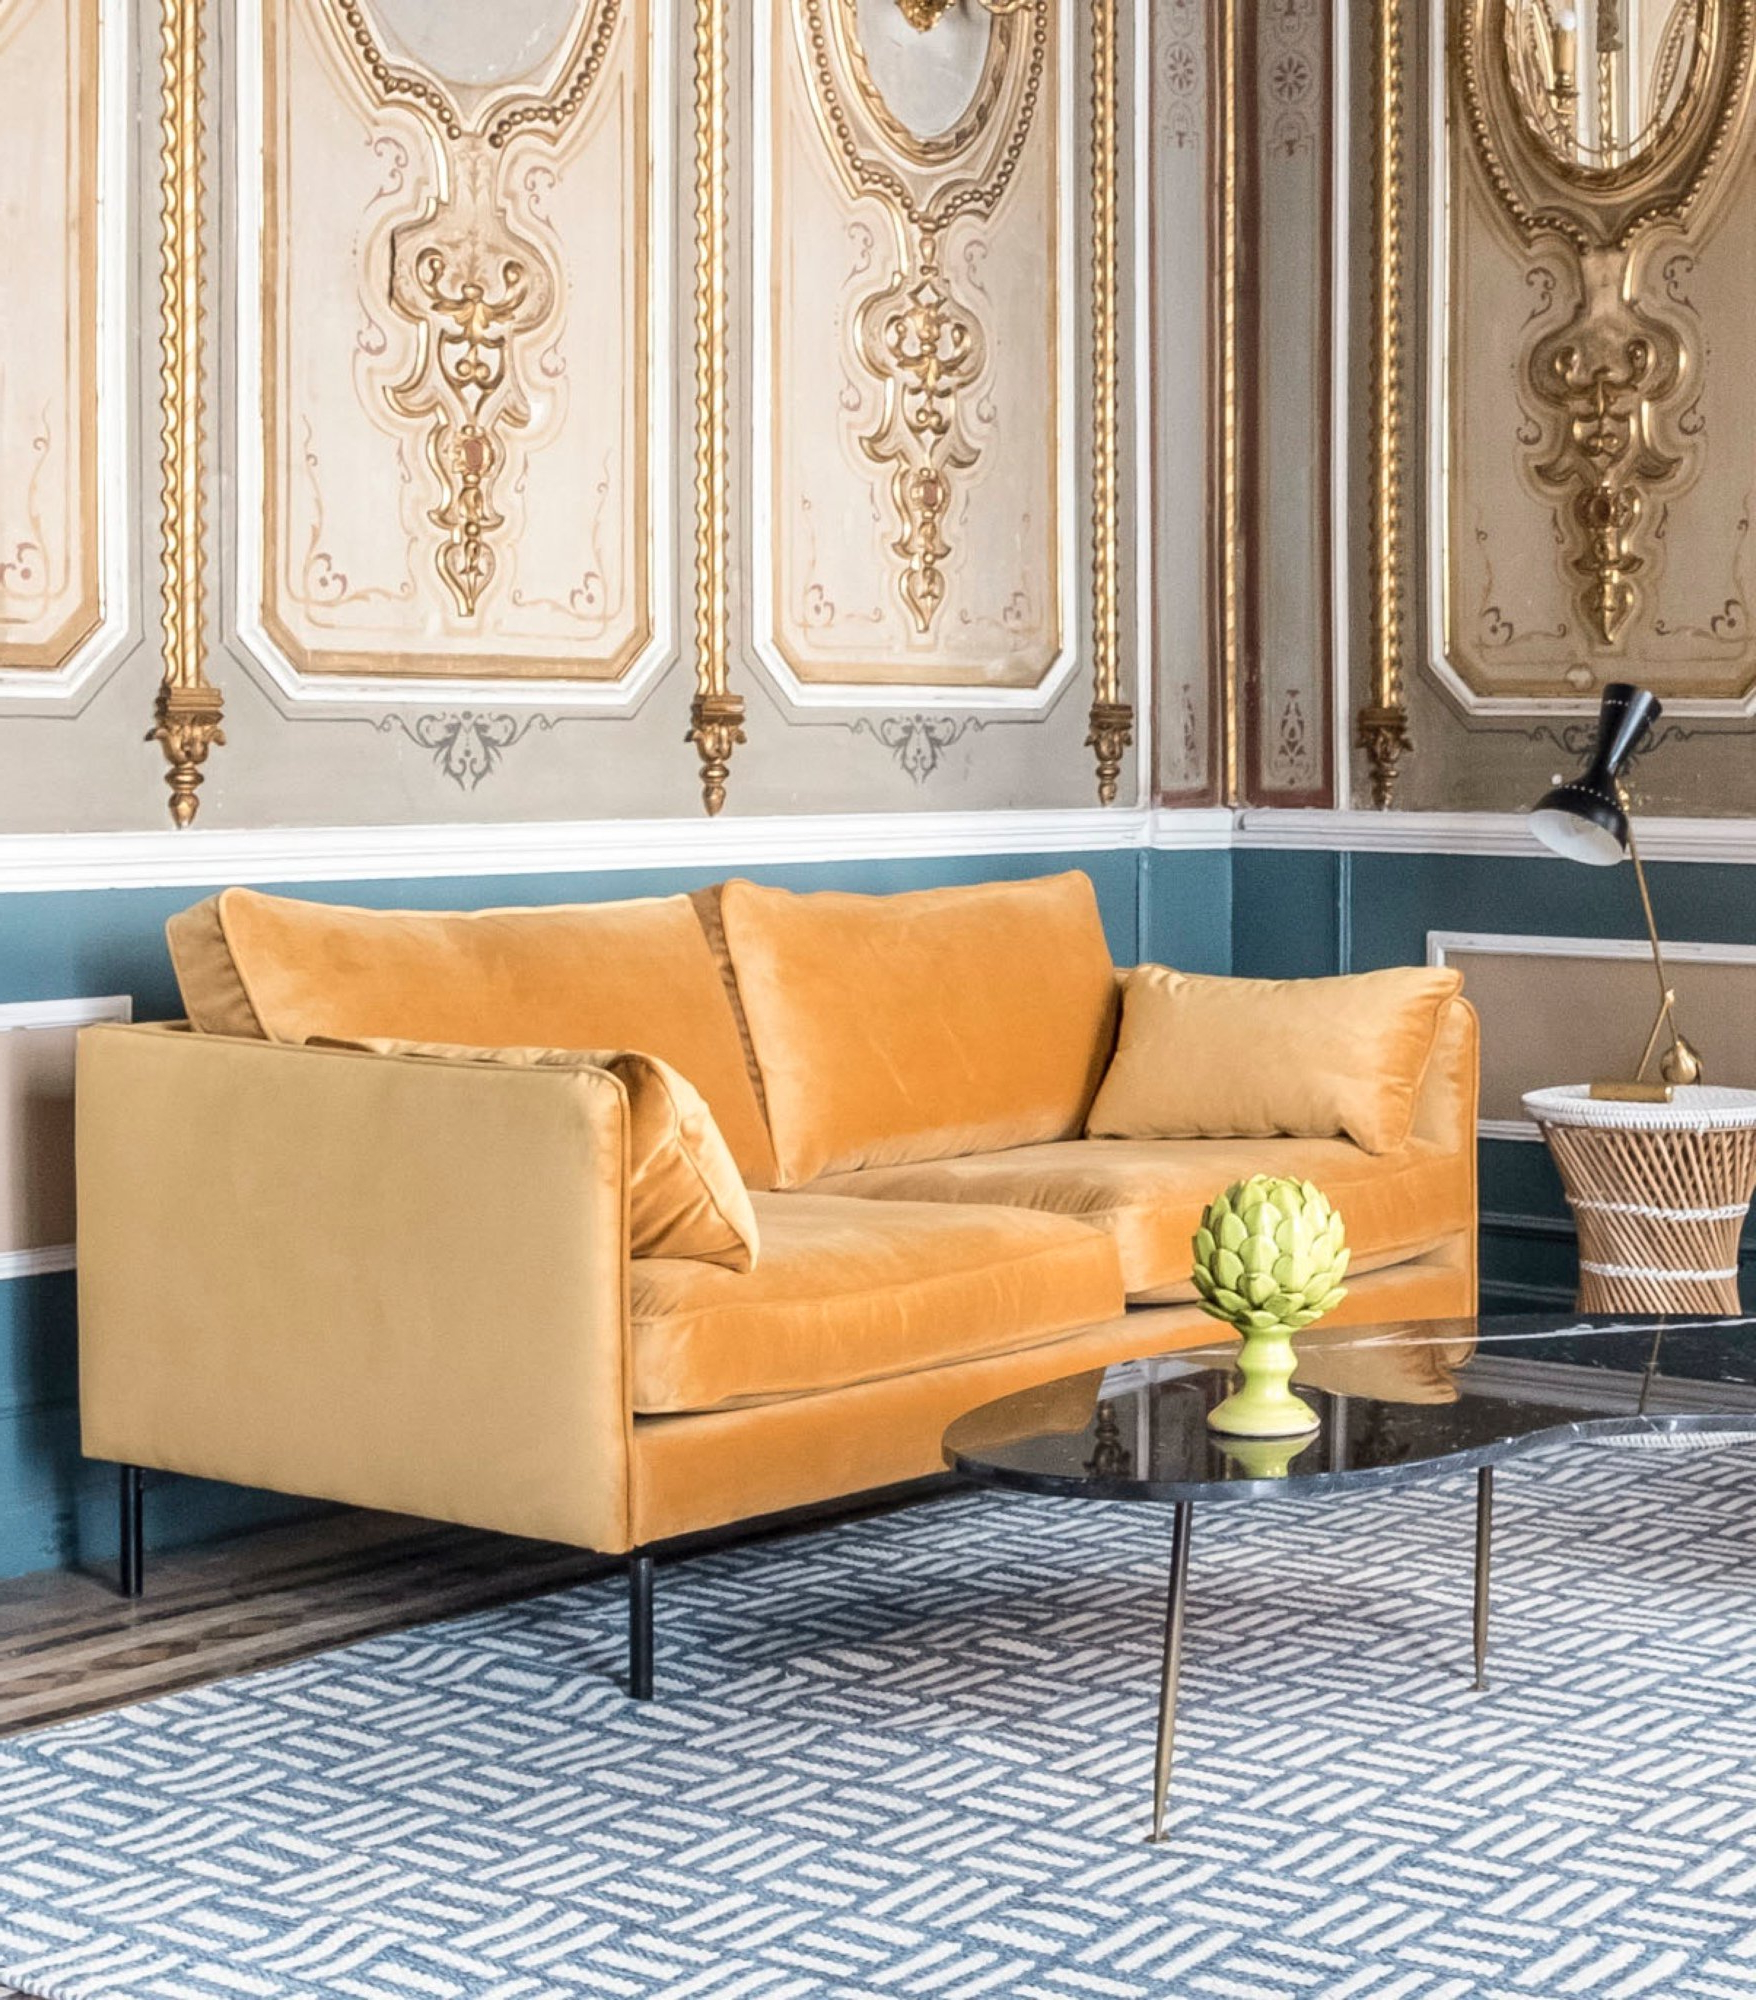 Sofa Terciopelo 3id6 sofà Diseà O Mostaza Rue Vintage 74